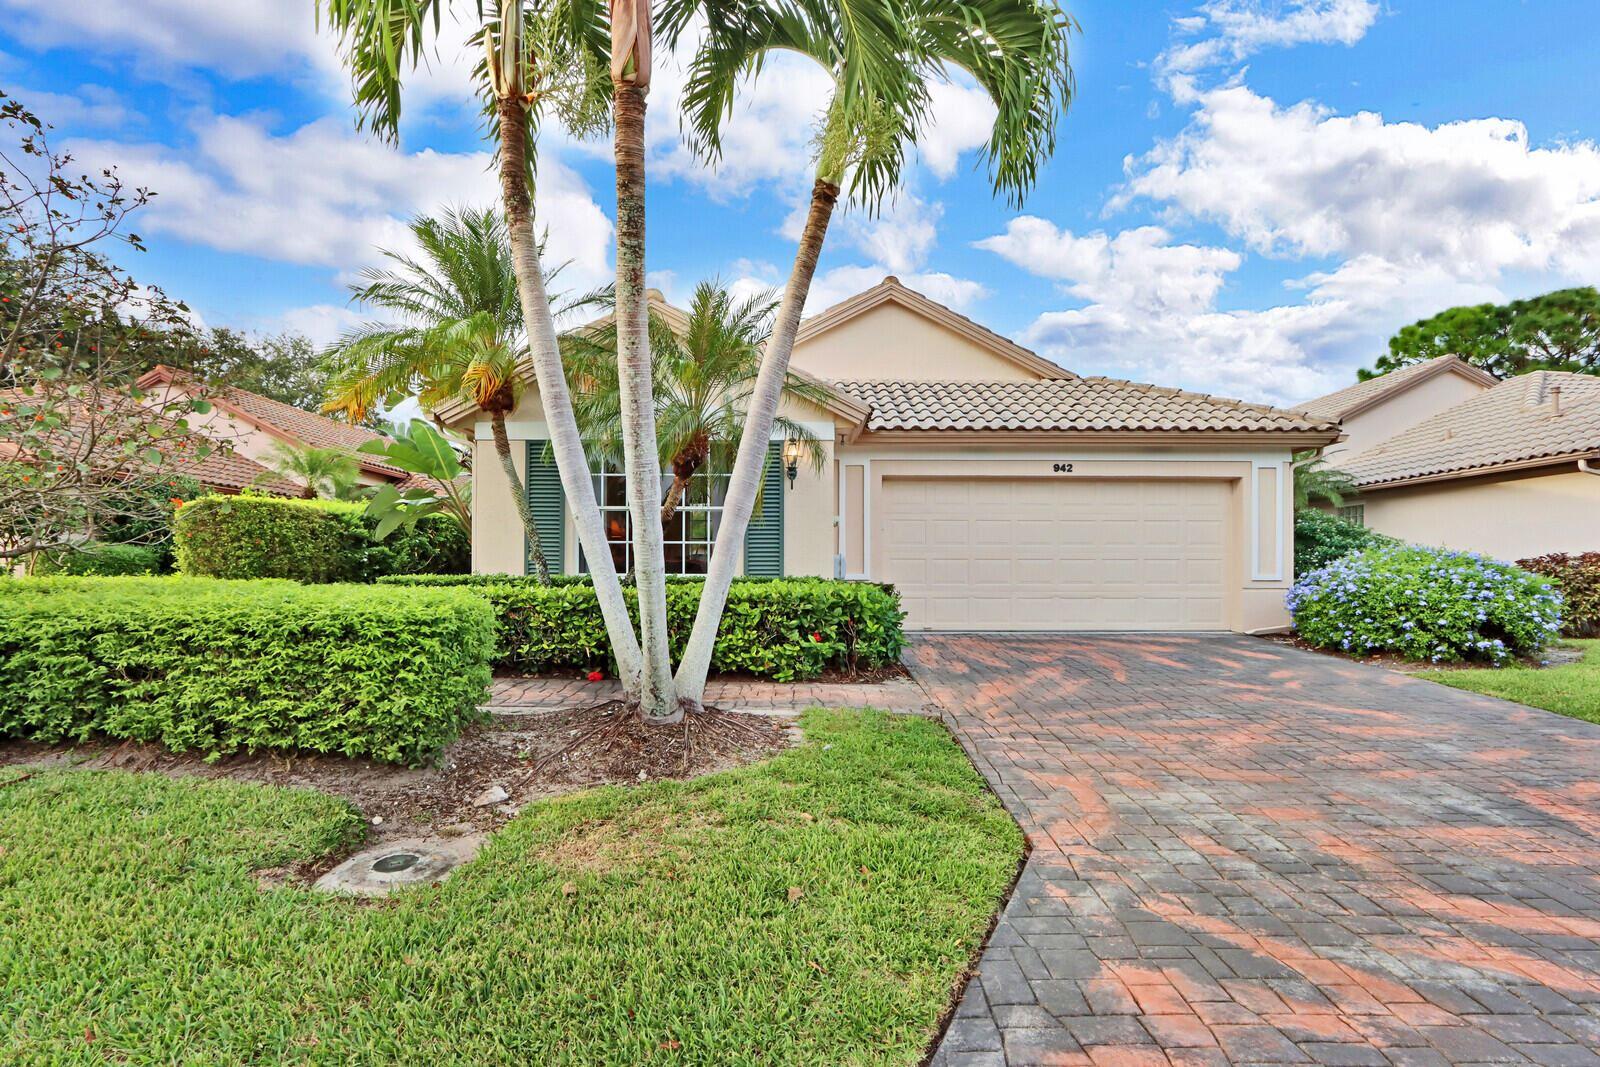 Photo of 942 Augusta Pointe Drive, Palm Beach Gardens, FL 33418 (MLS # RX-10751936)